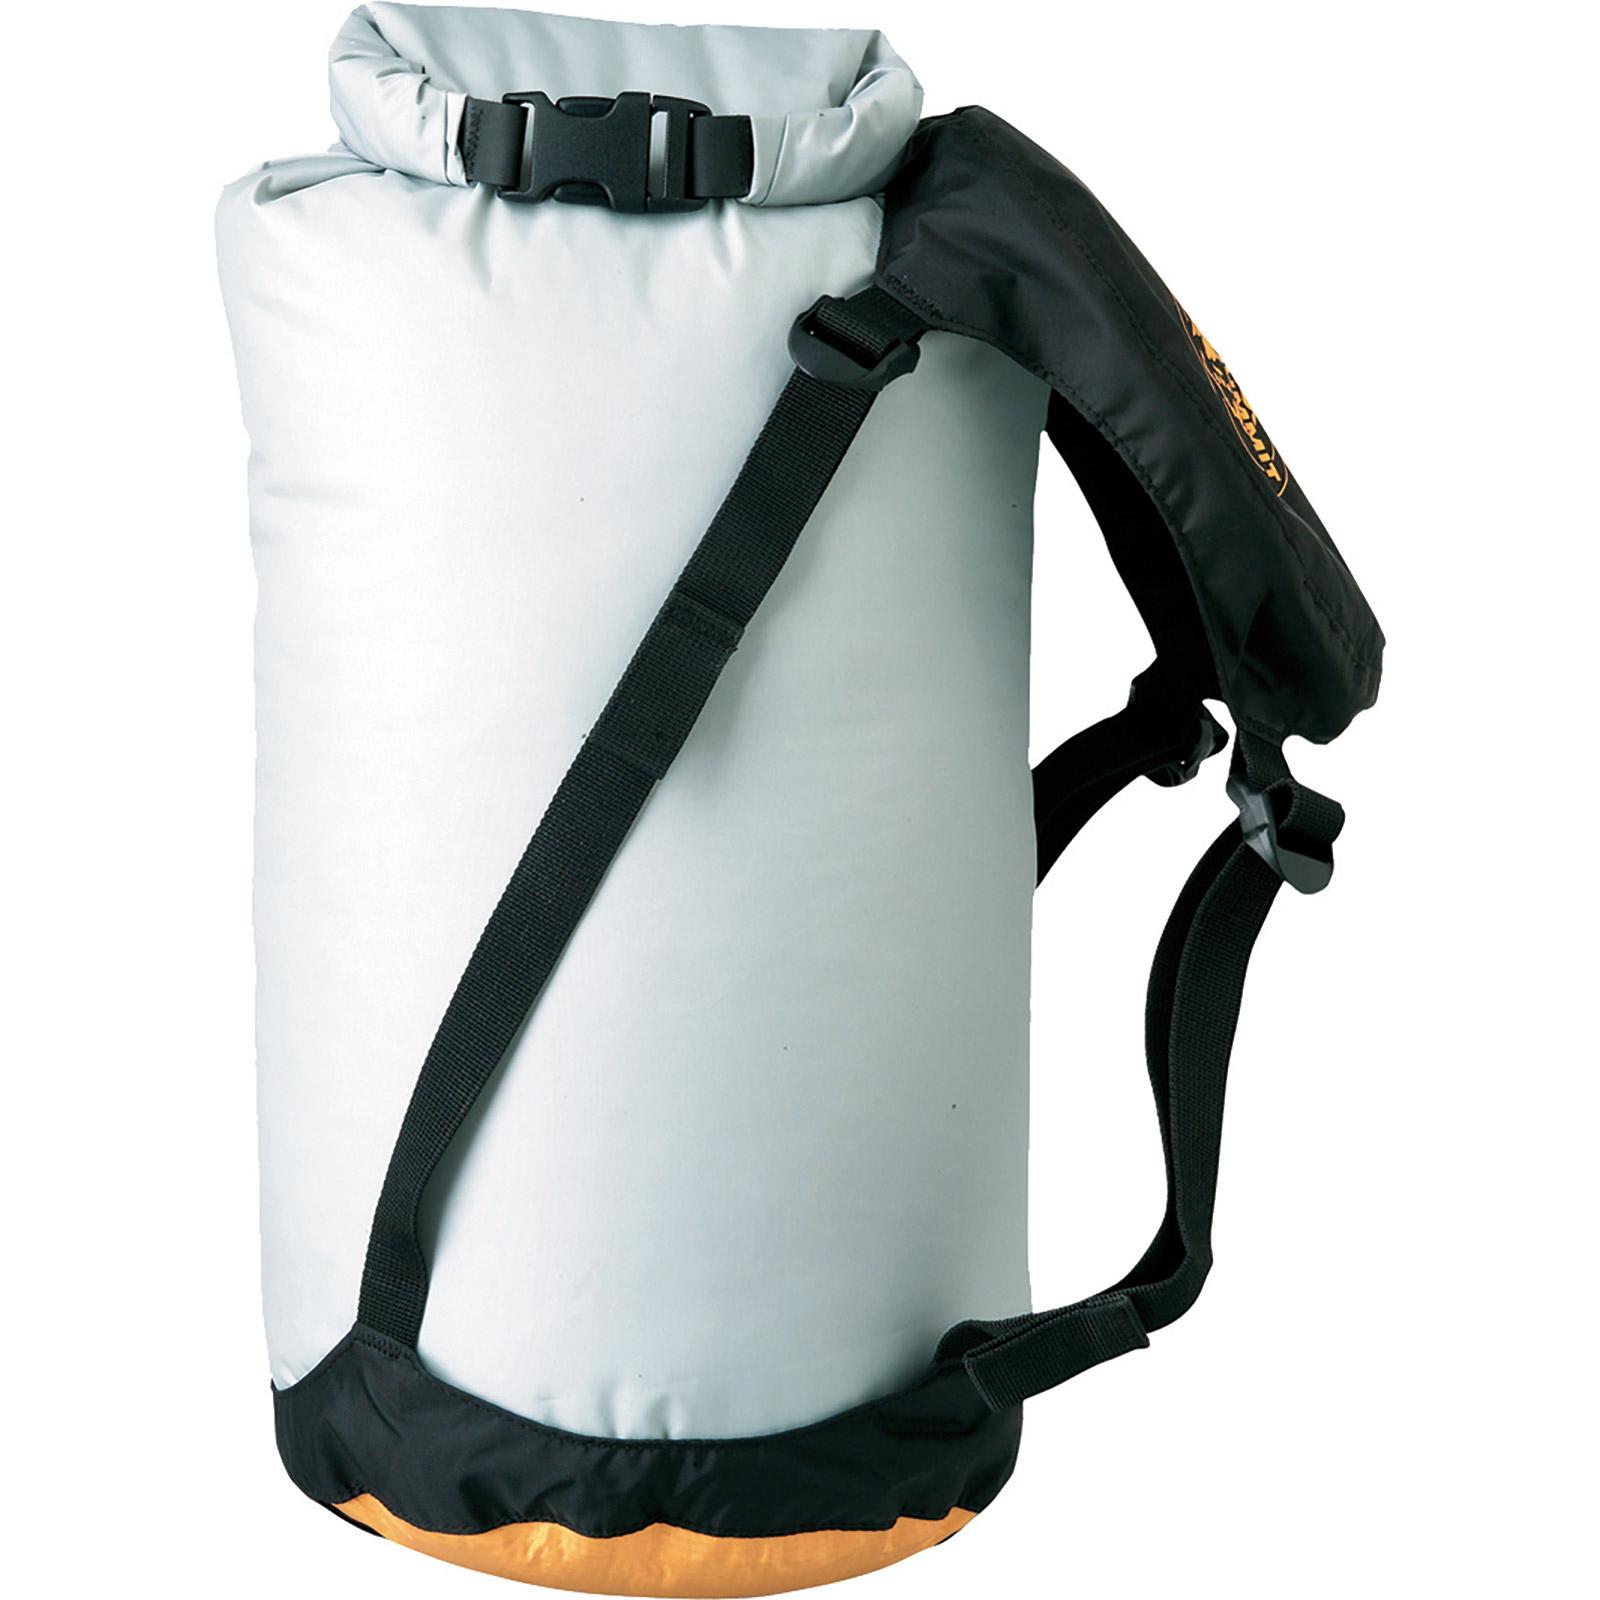 Sleeping bag compression dry sack - Sea to Summit